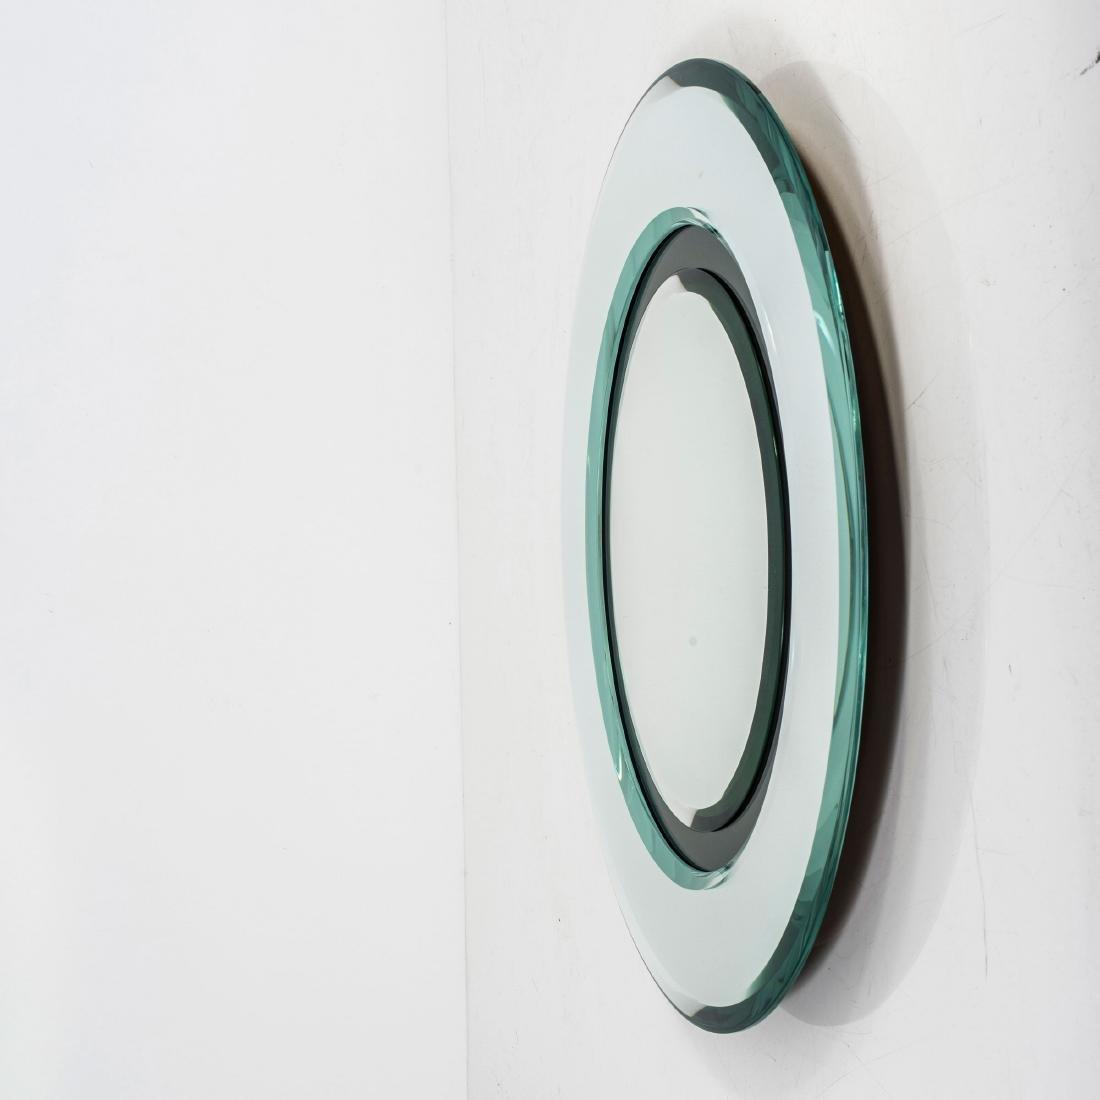 Mirror, c. 1970 - 2